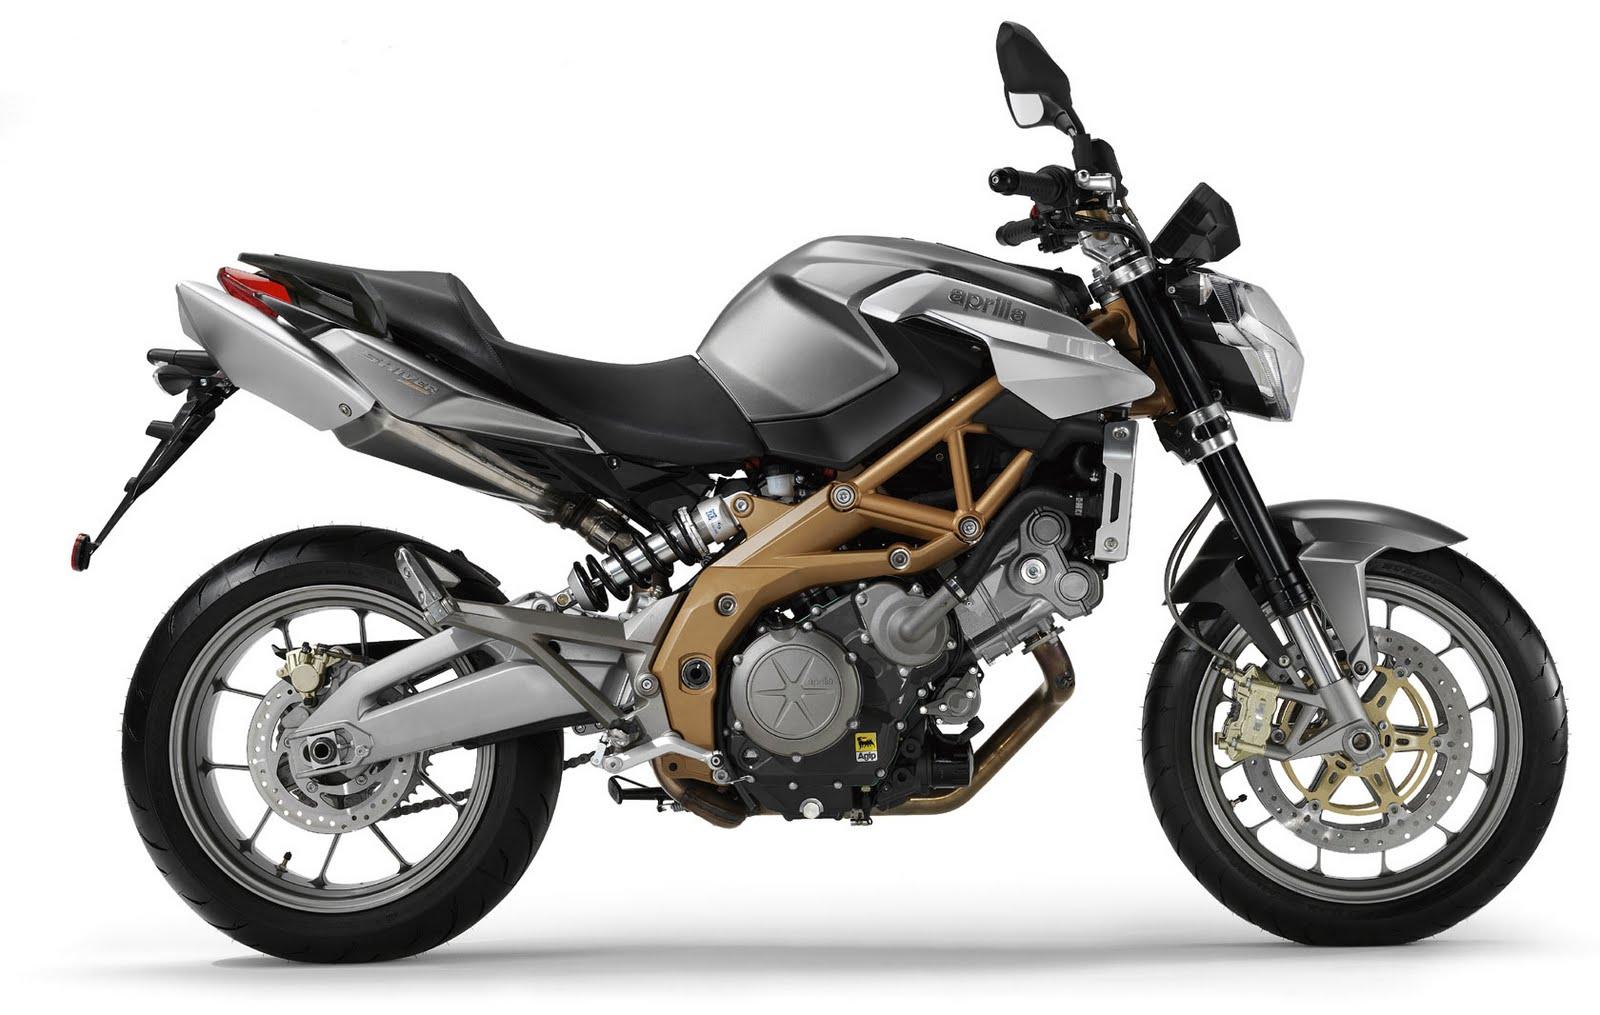 top motorcycle 2009 aprilia shiver 750. Black Bedroom Furniture Sets. Home Design Ideas